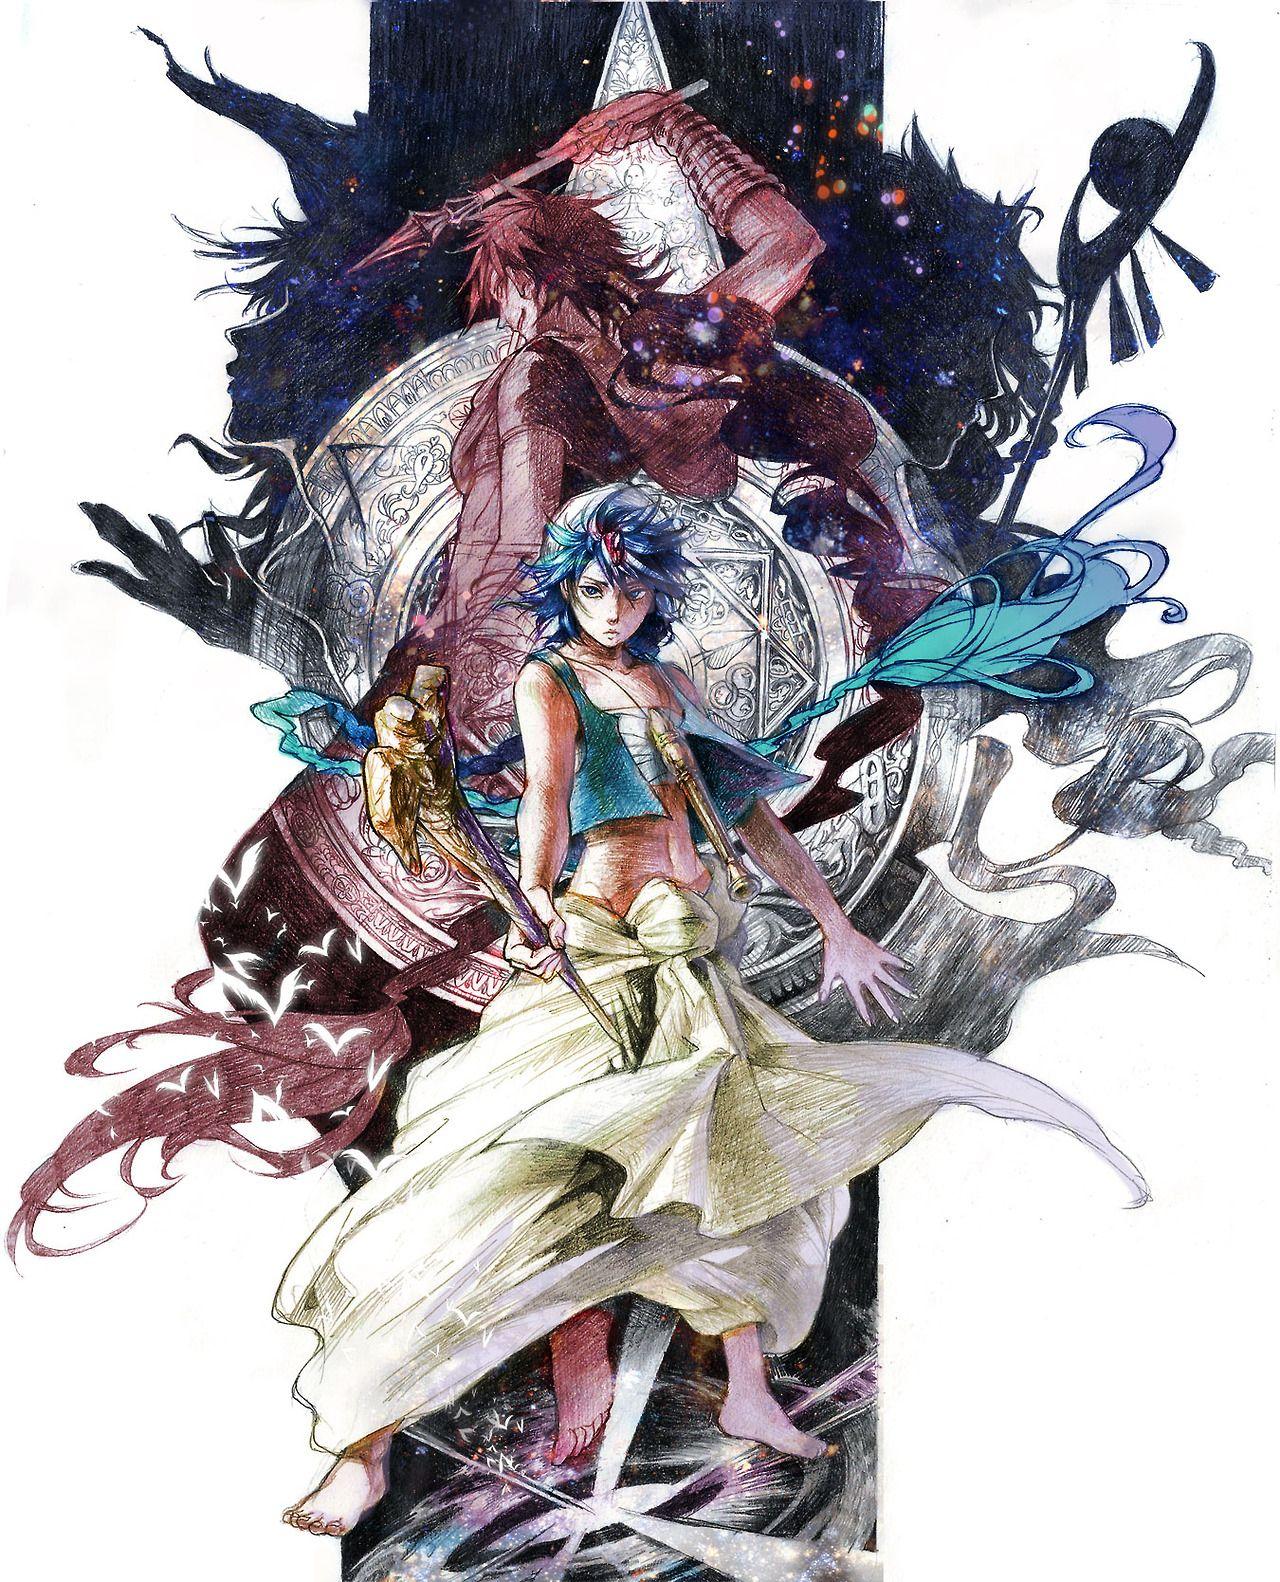 MAGI The Labyrinth of Magic Anime magi, Magi judal, Magi